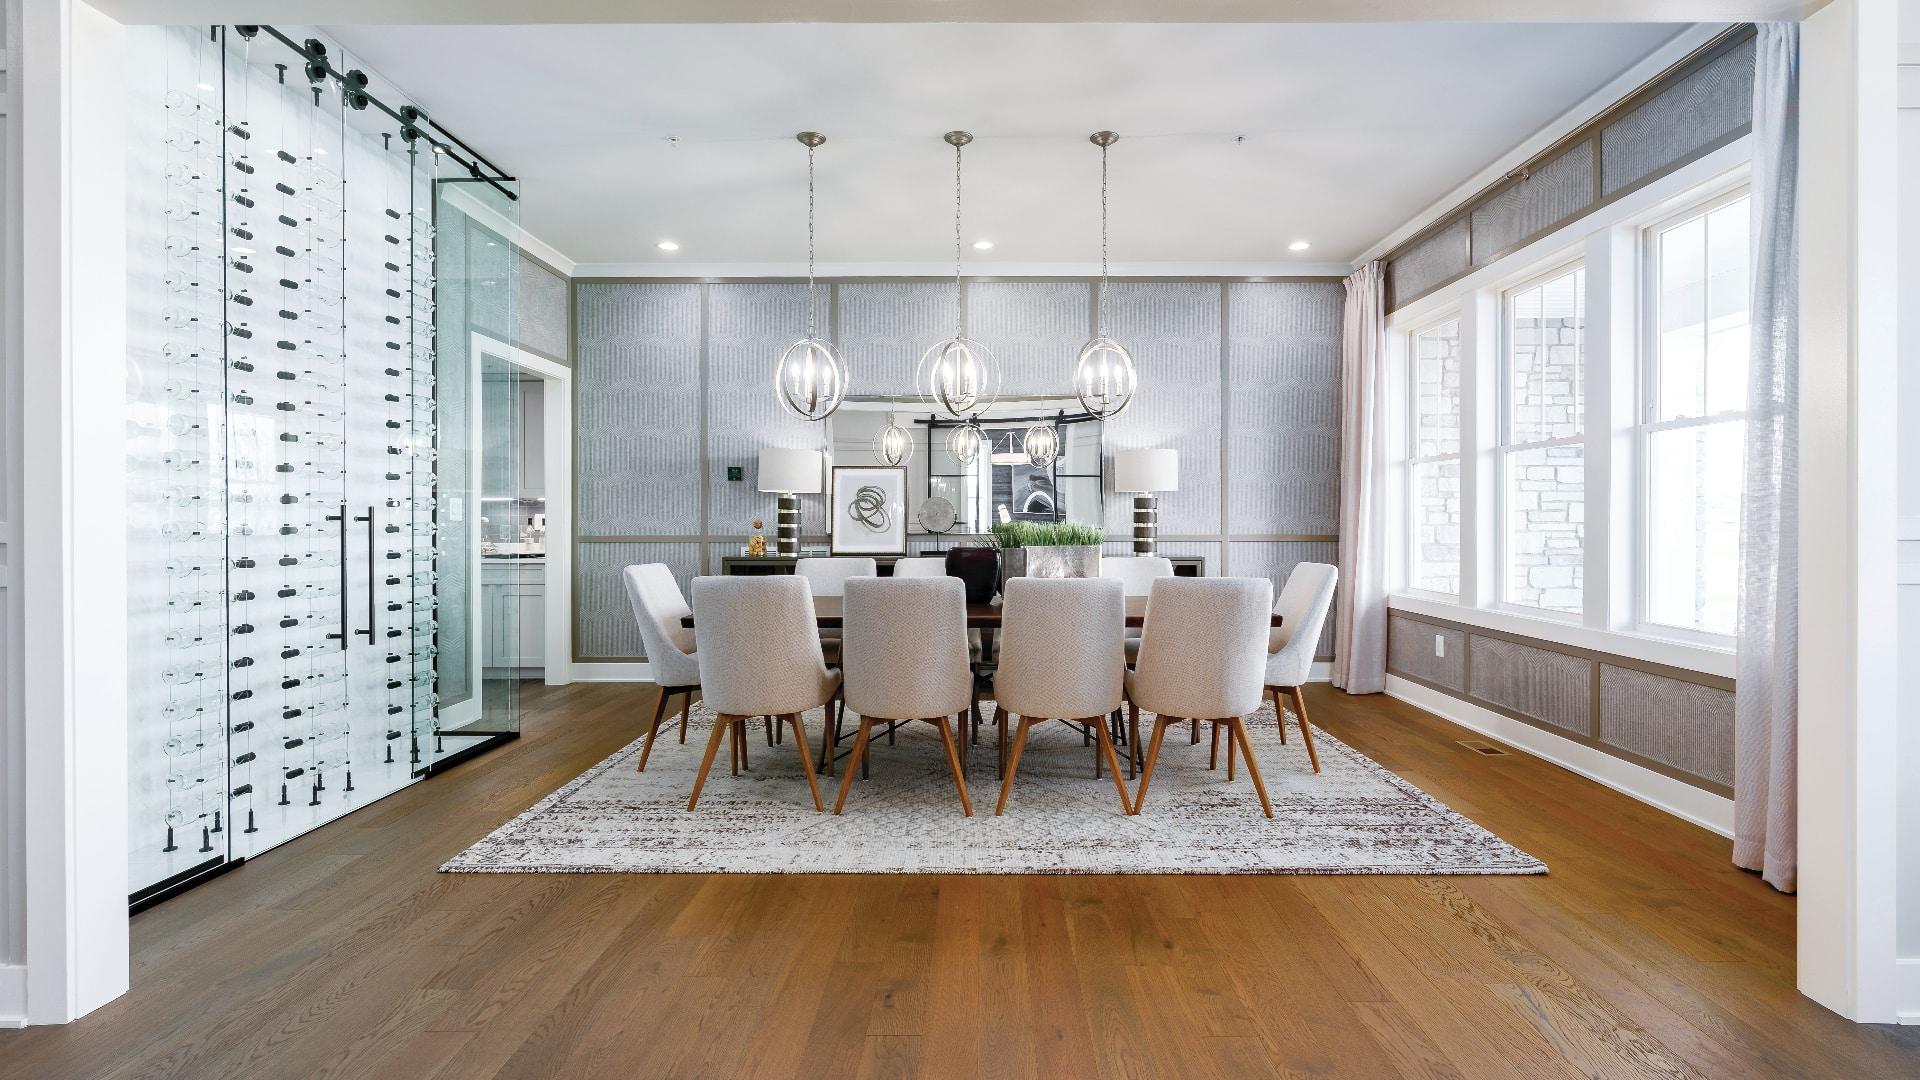 Elegant, formal dining rooms